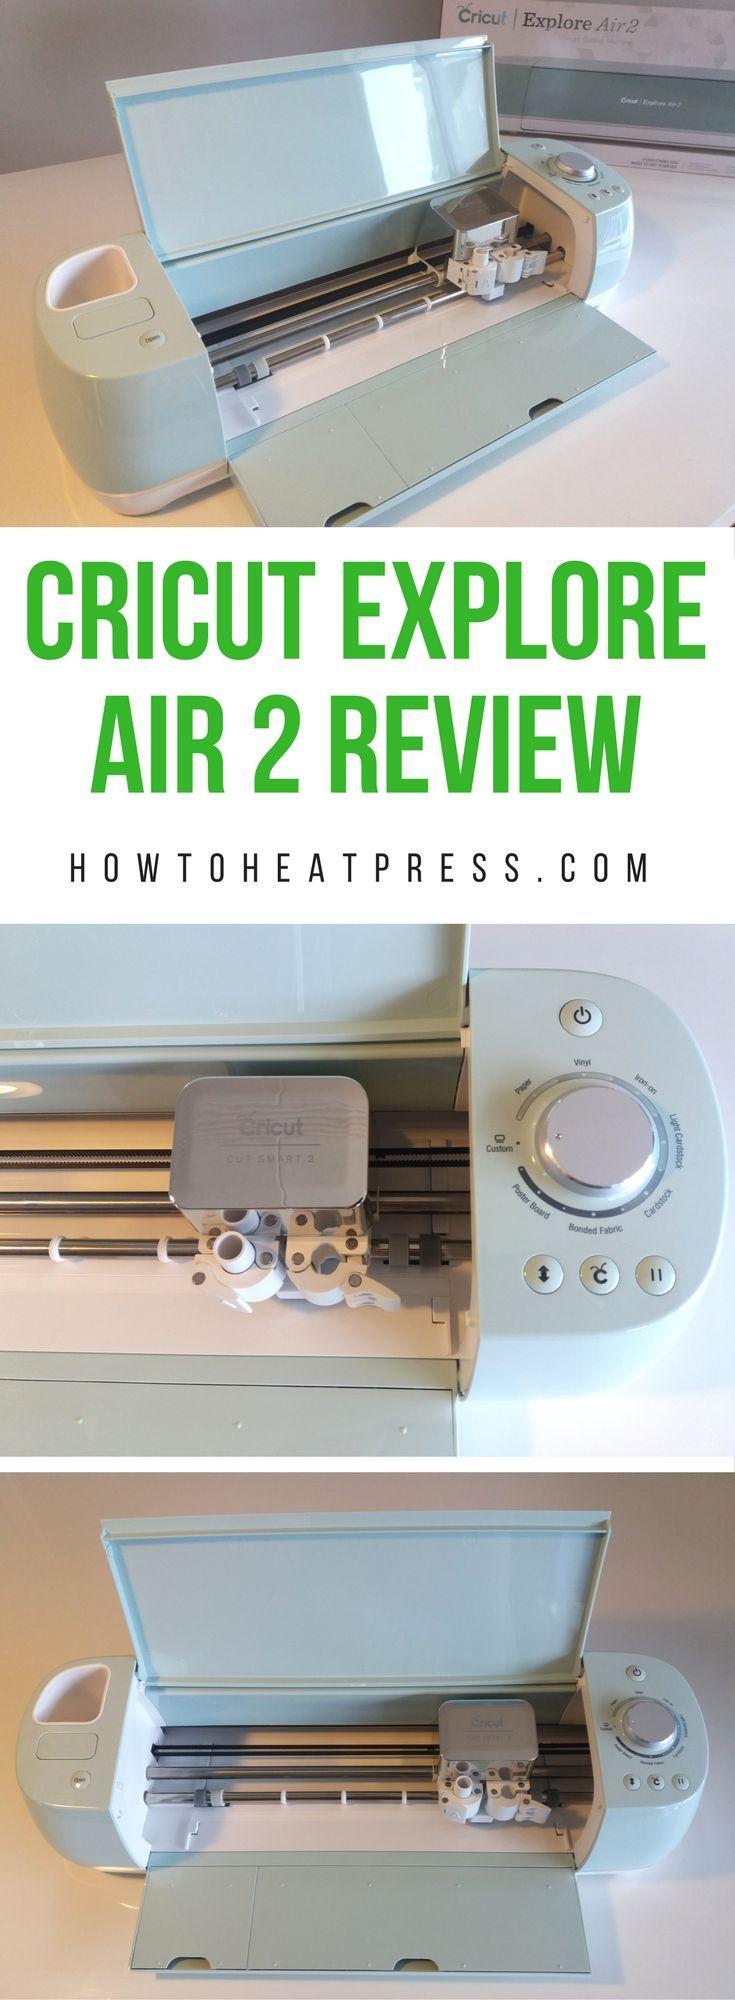 Cricut Explore Air 2 Review Pros, Cons, & Everything Else